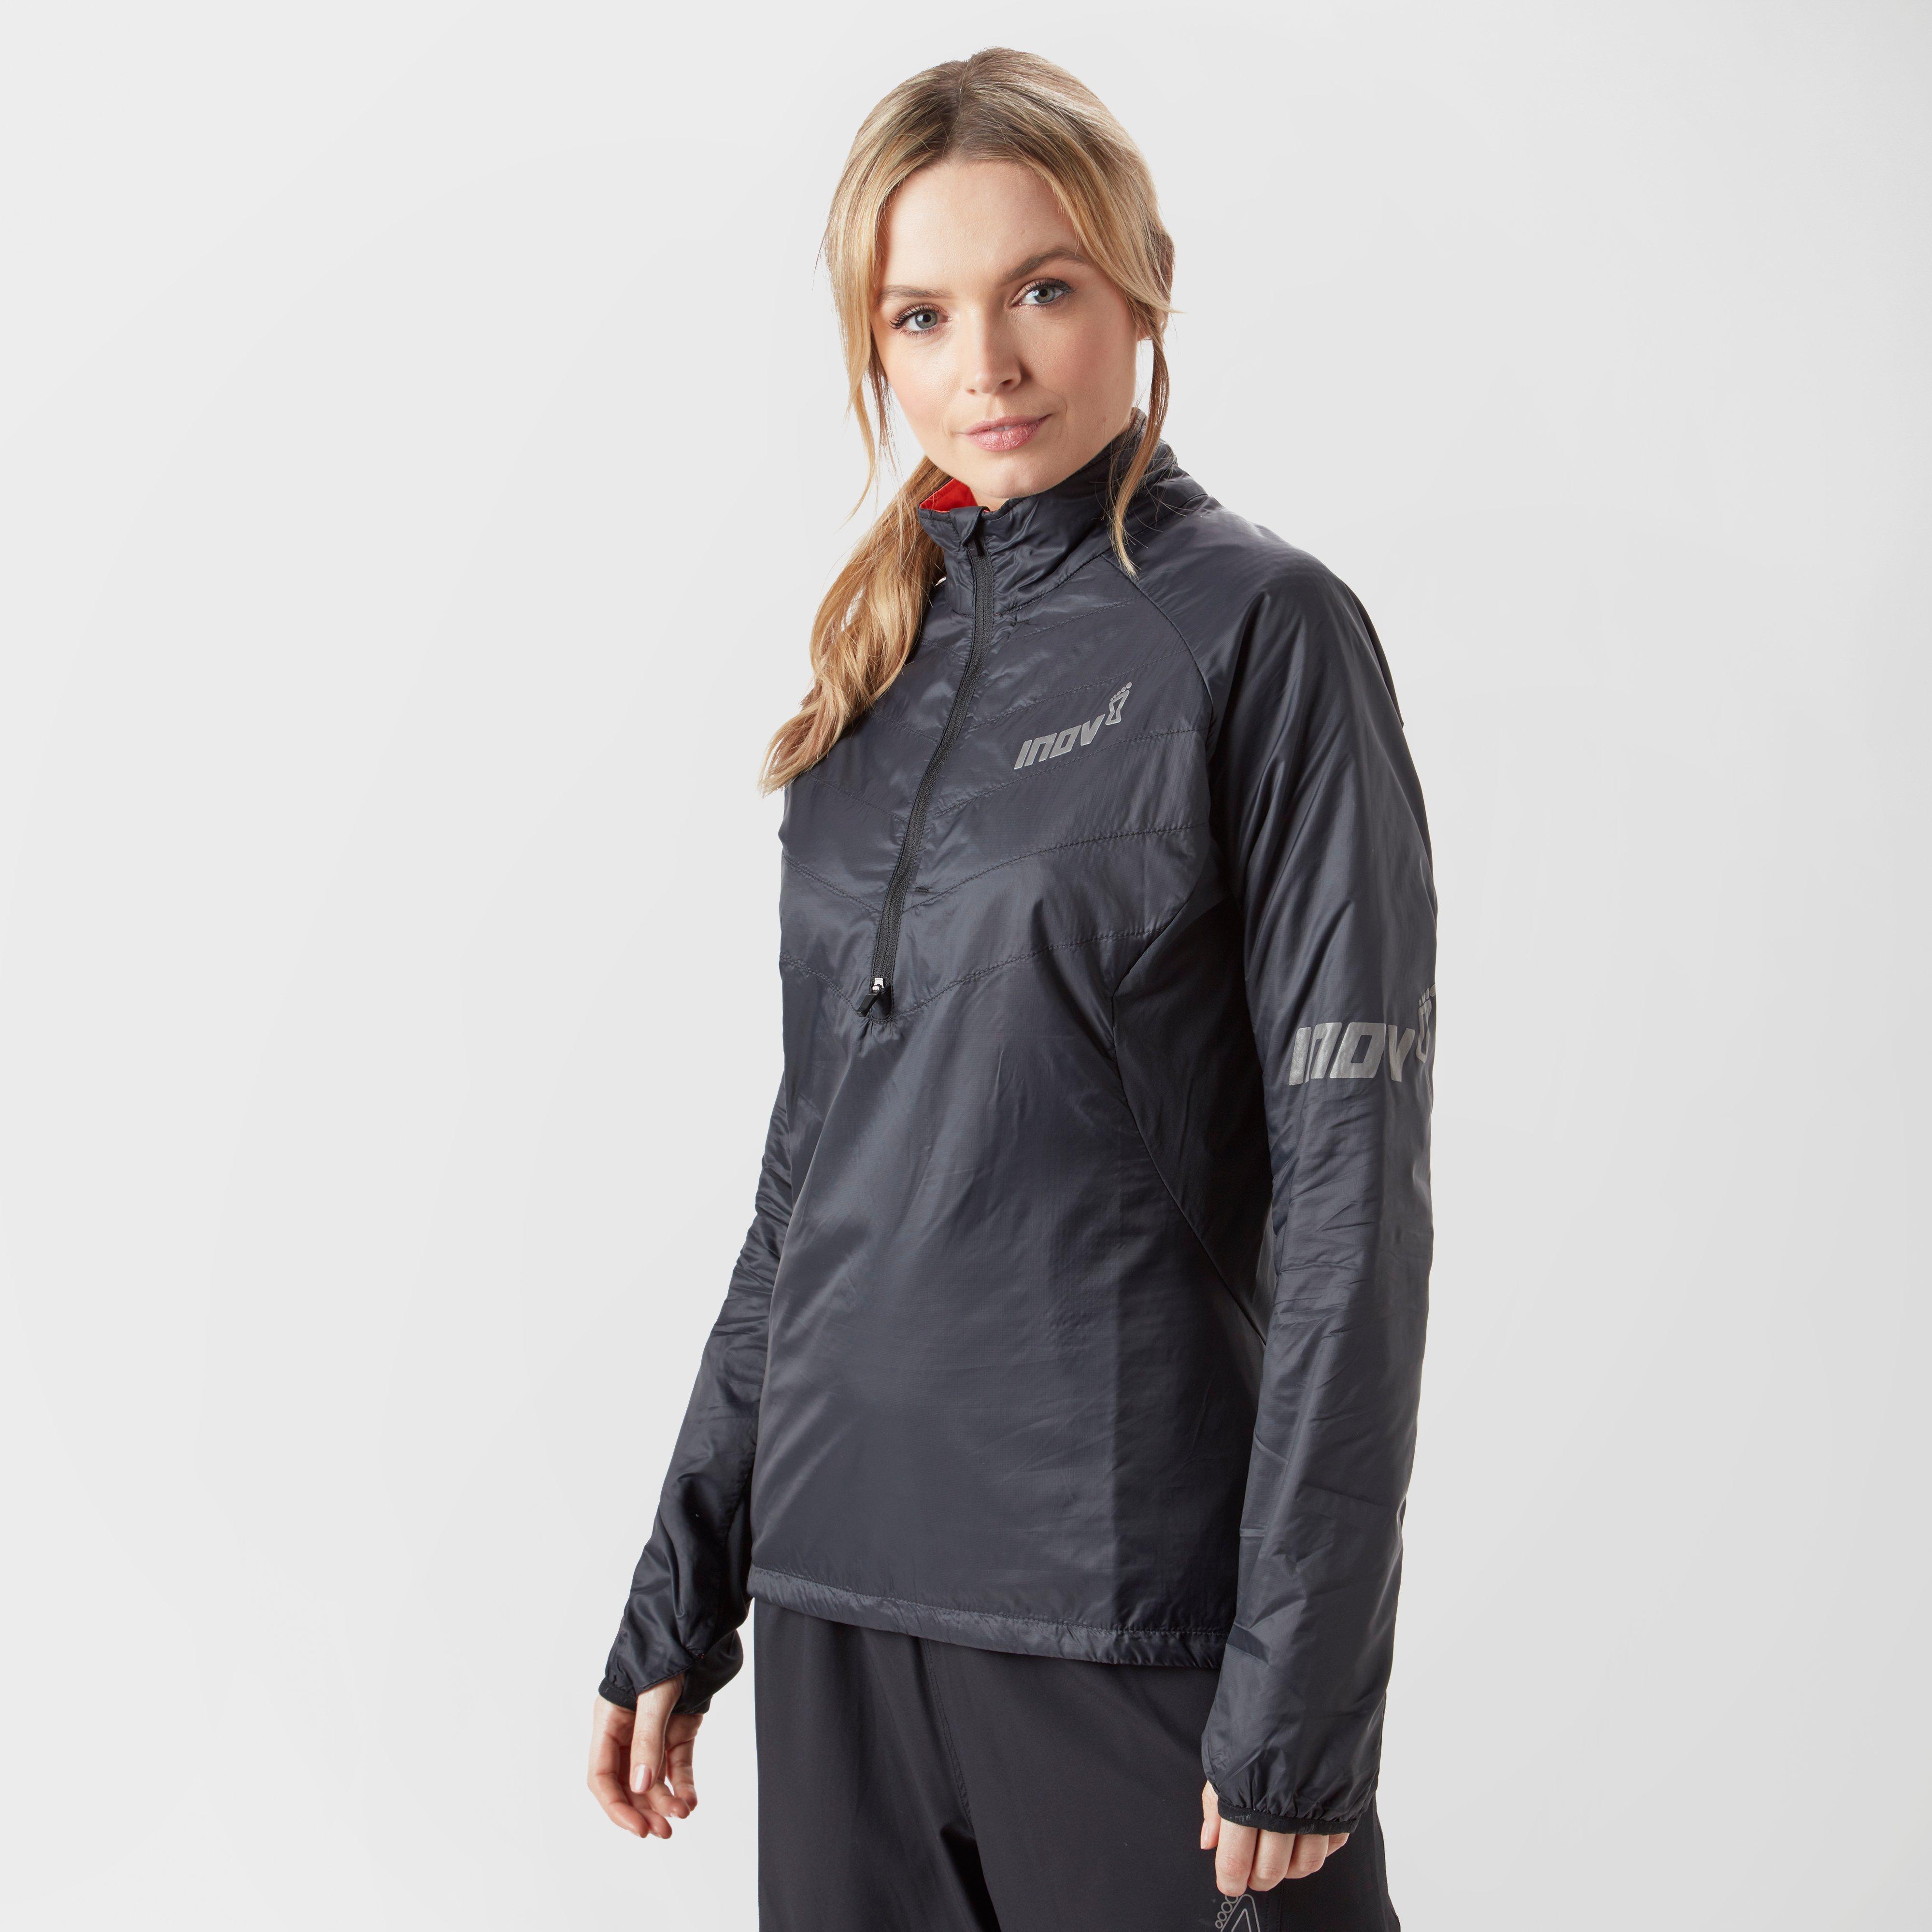 Inov-8 Women's Thermoshell Running Jacket, Black